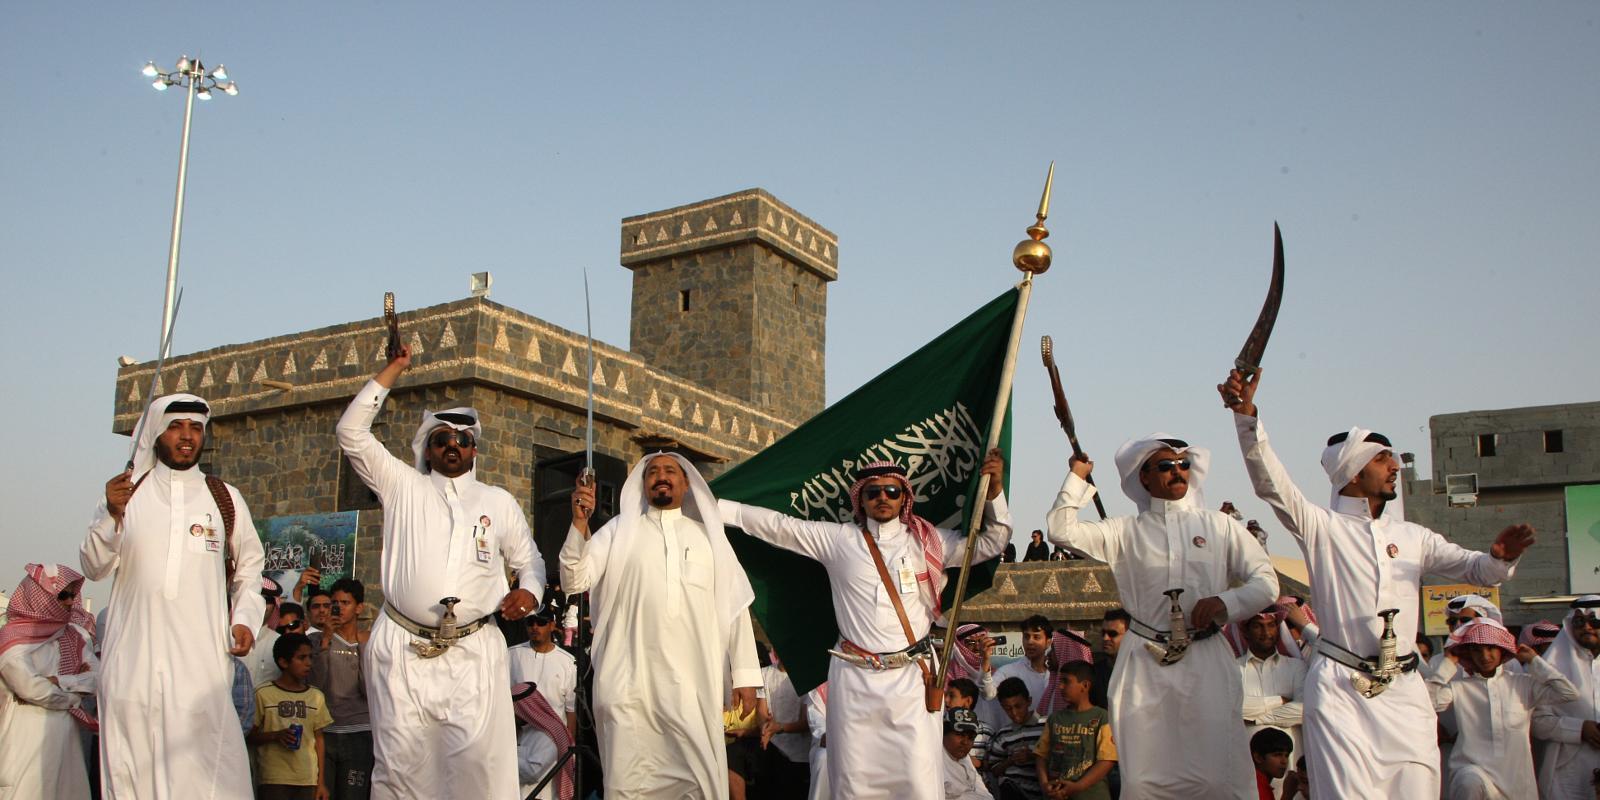 saudi arabia dating and marriage customs